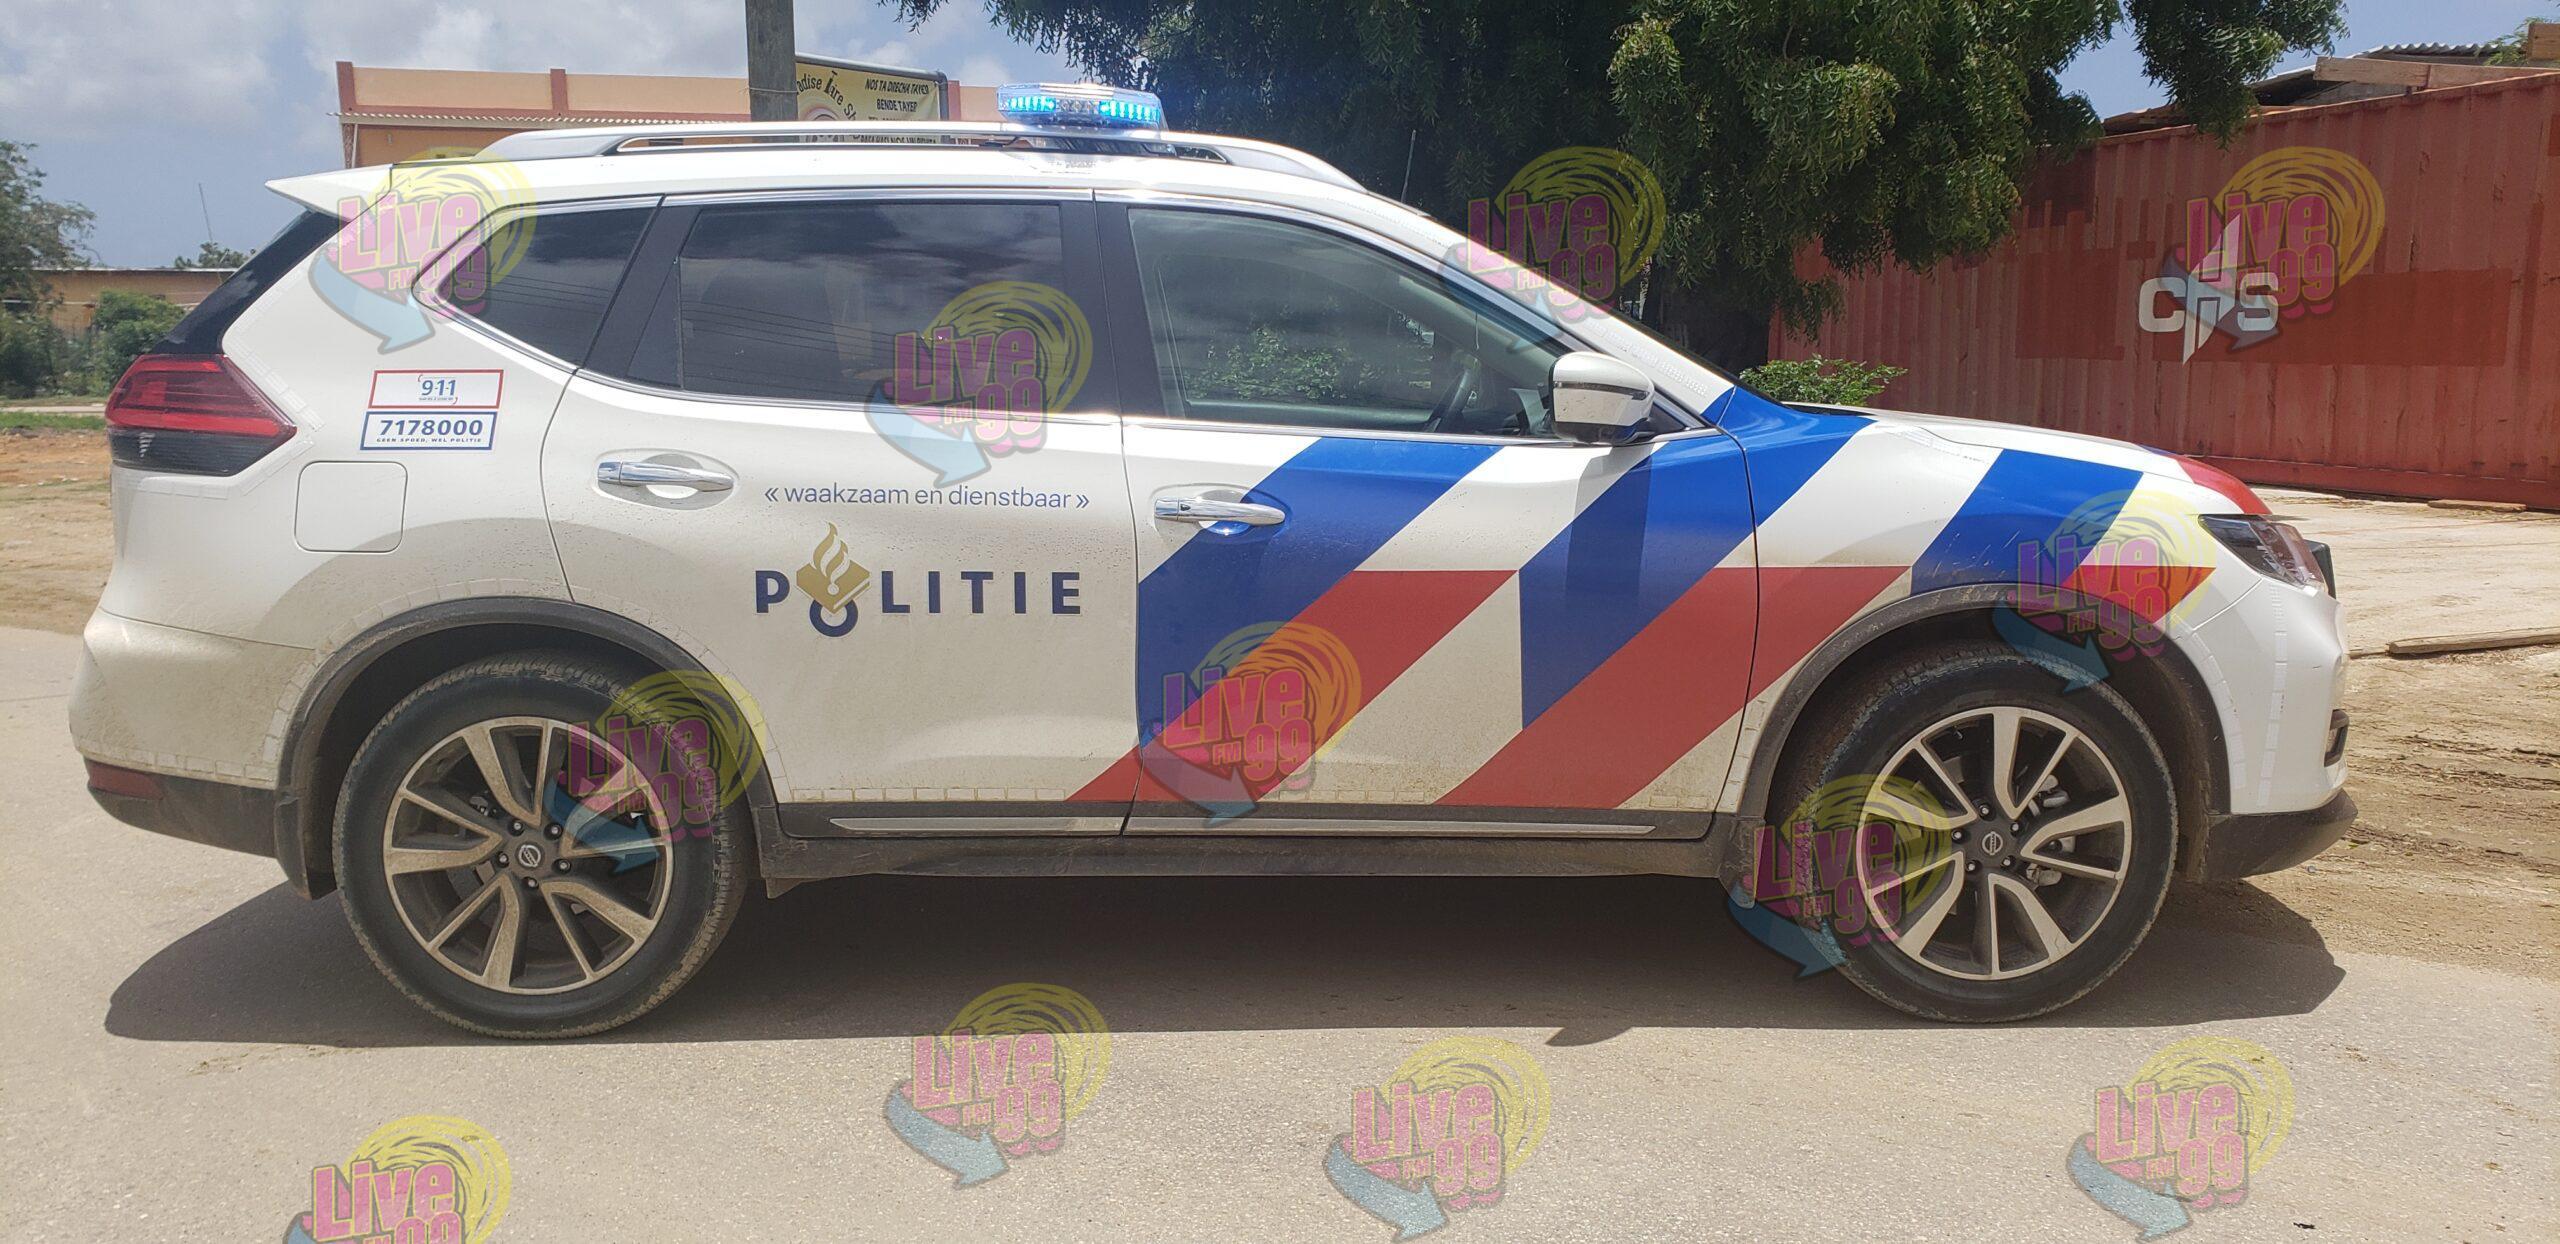 NOTISIA DI POLIS DI DJABIÈRNÈ 18 SÈPTÈMBER TE KU DJALUNA 21 DI SÈPTÈMBER 2020